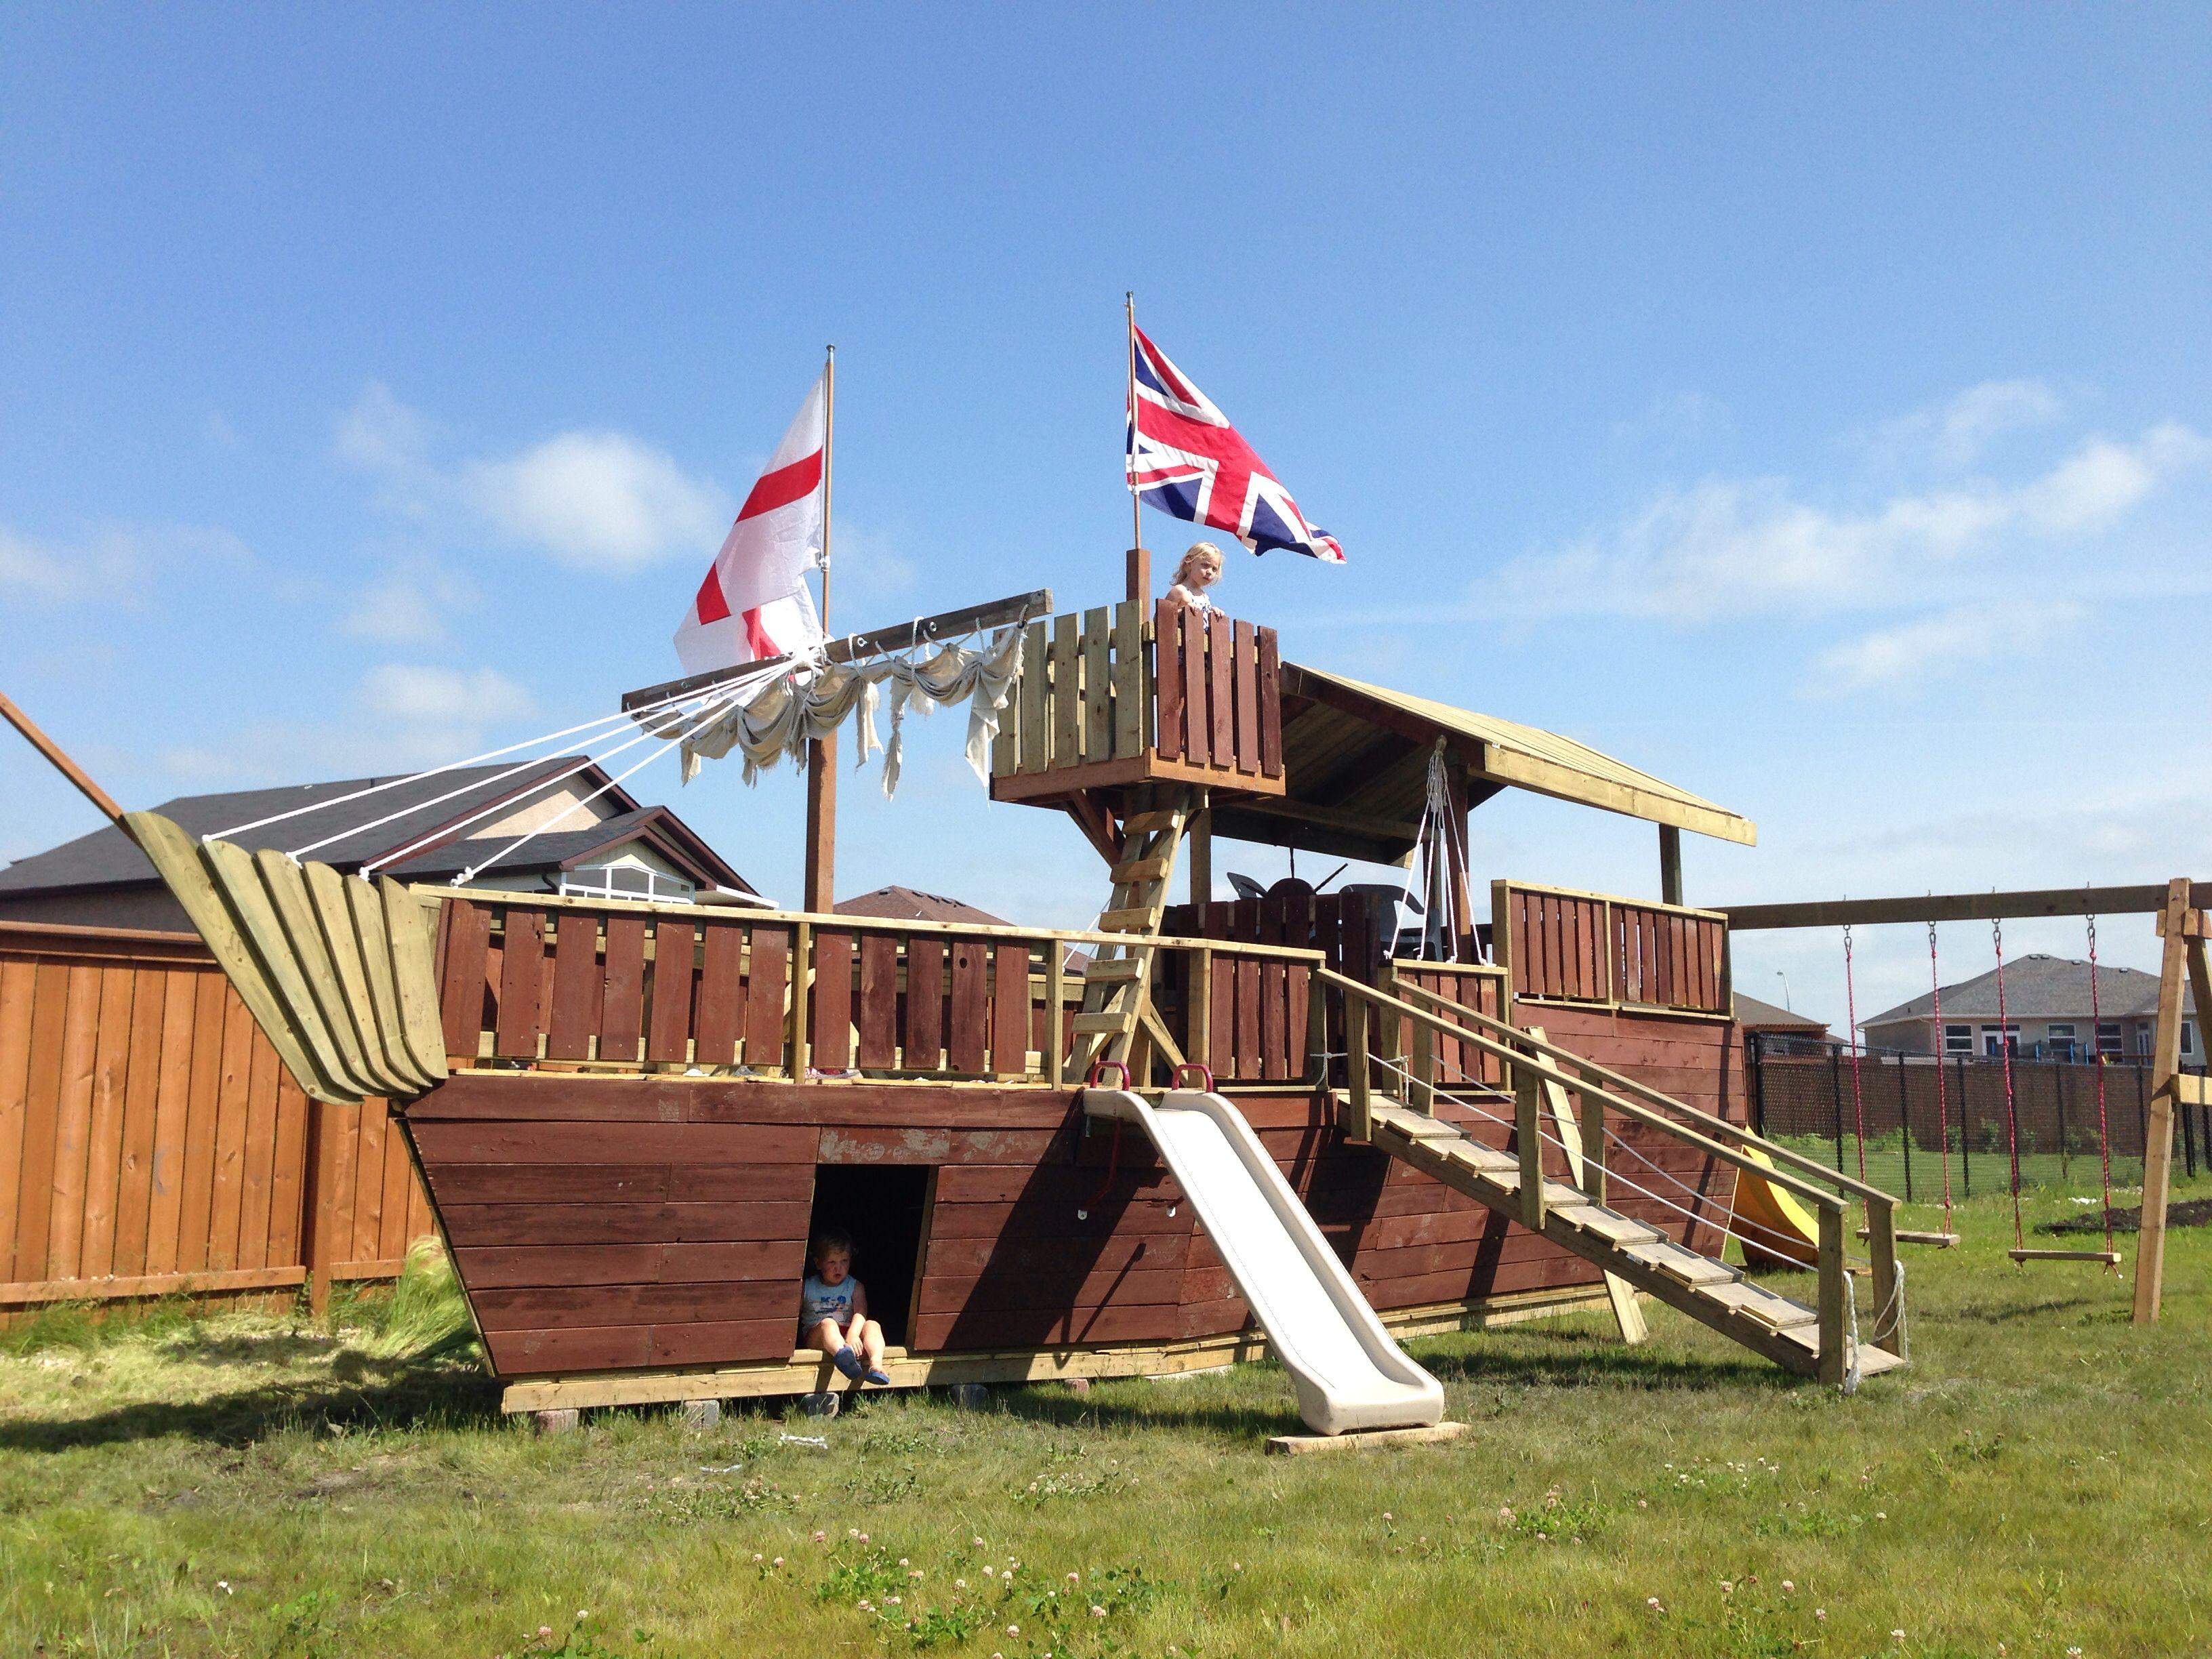 Pirate ship playhouse | Kids will love | Kids outside ...